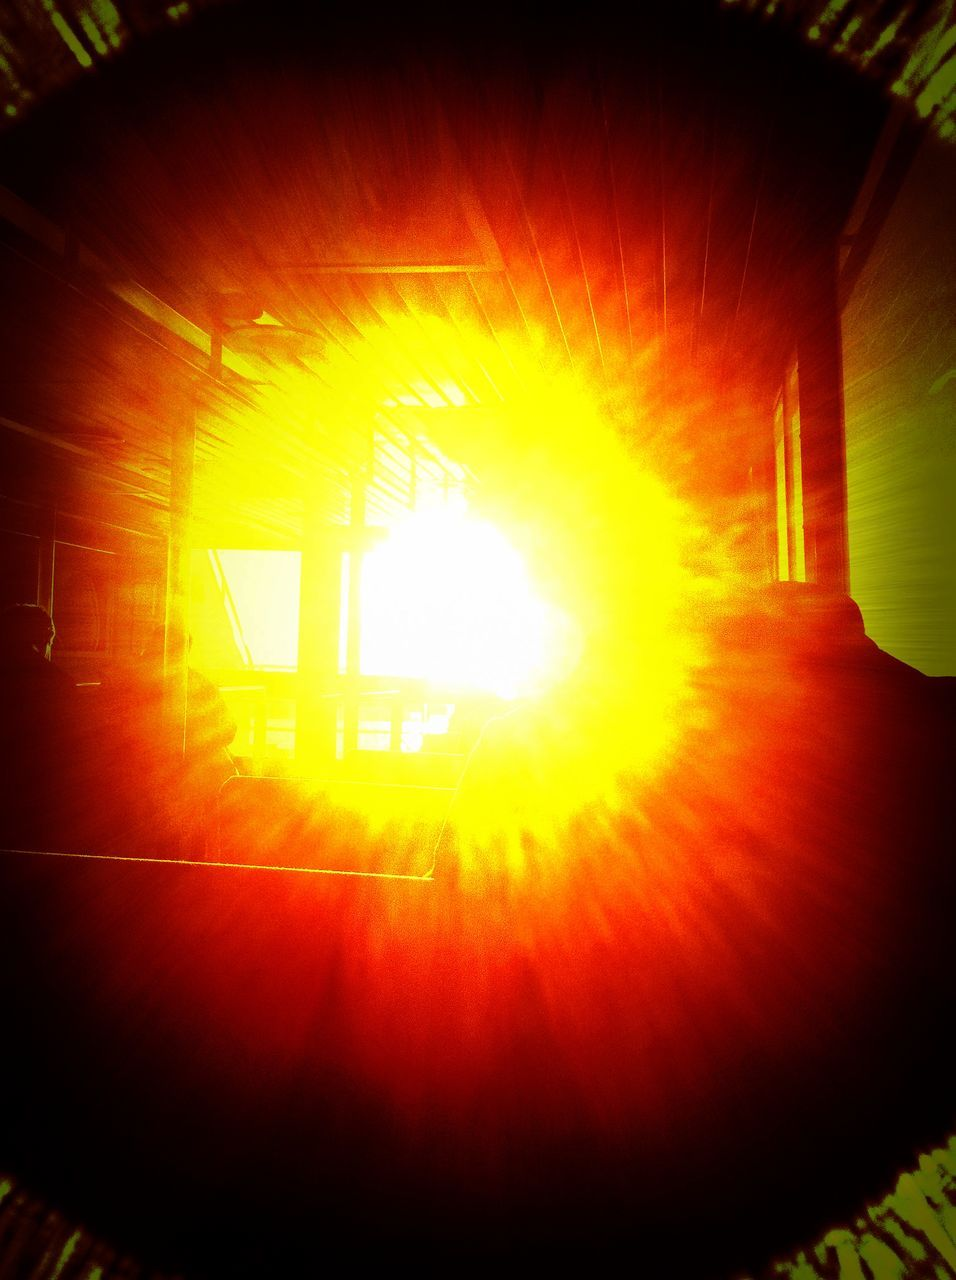 sunlight, bright, sunbeam, lens flare, indoors, no people, brightly lit, close-up, illuminated, day